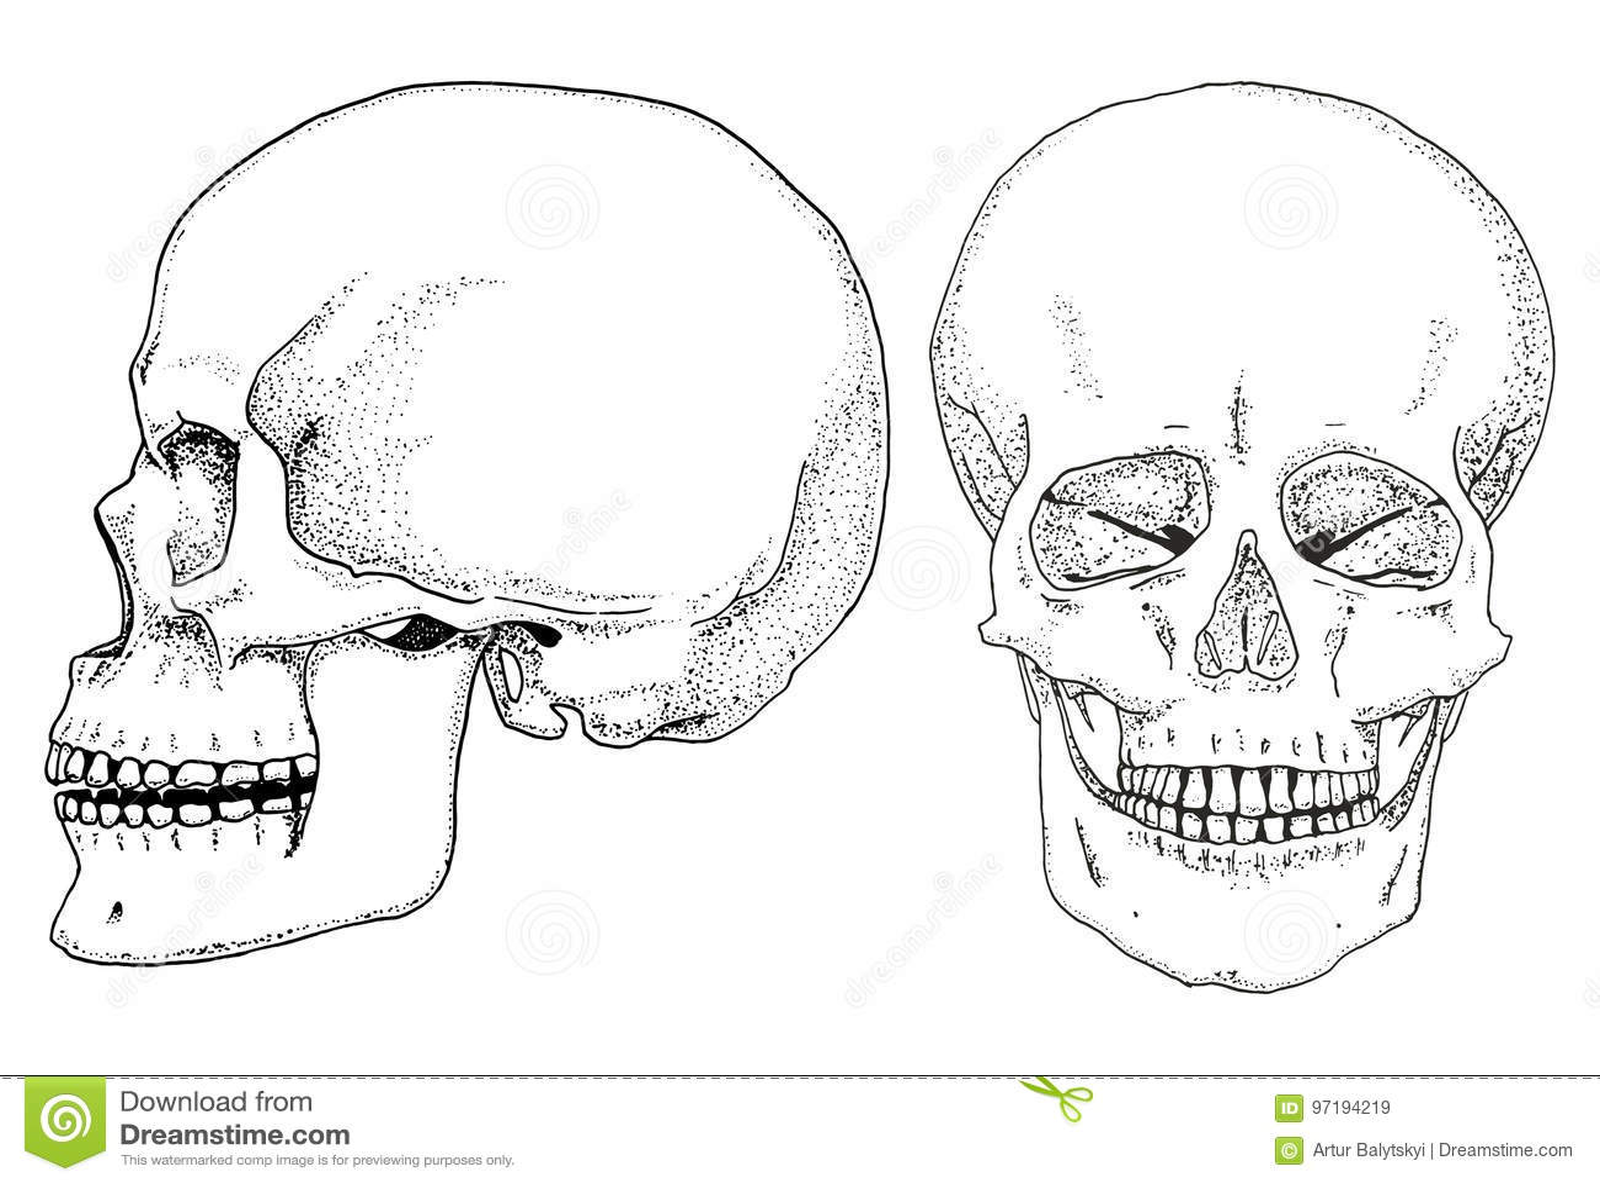 Human Biology Anatomy Illustration Engraved Hand Drawn